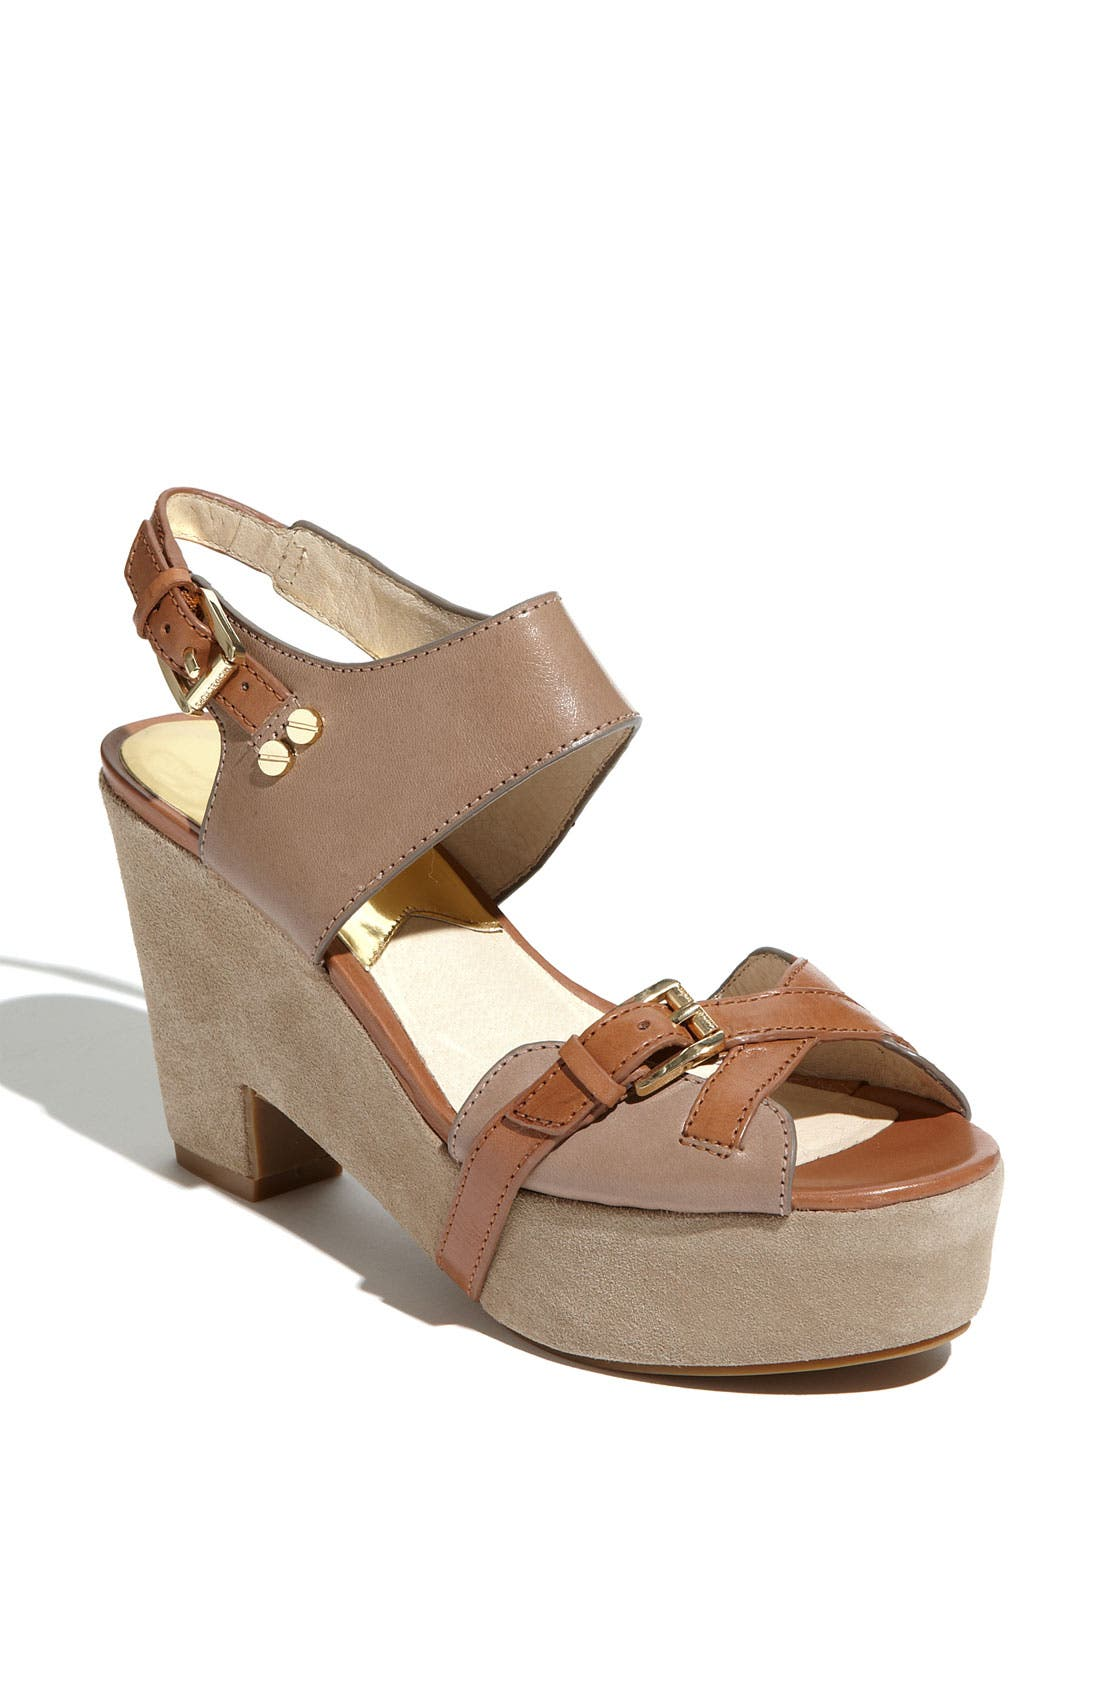 Main Image - MICHAEL Michael Kors 'Fallyn' Sandal